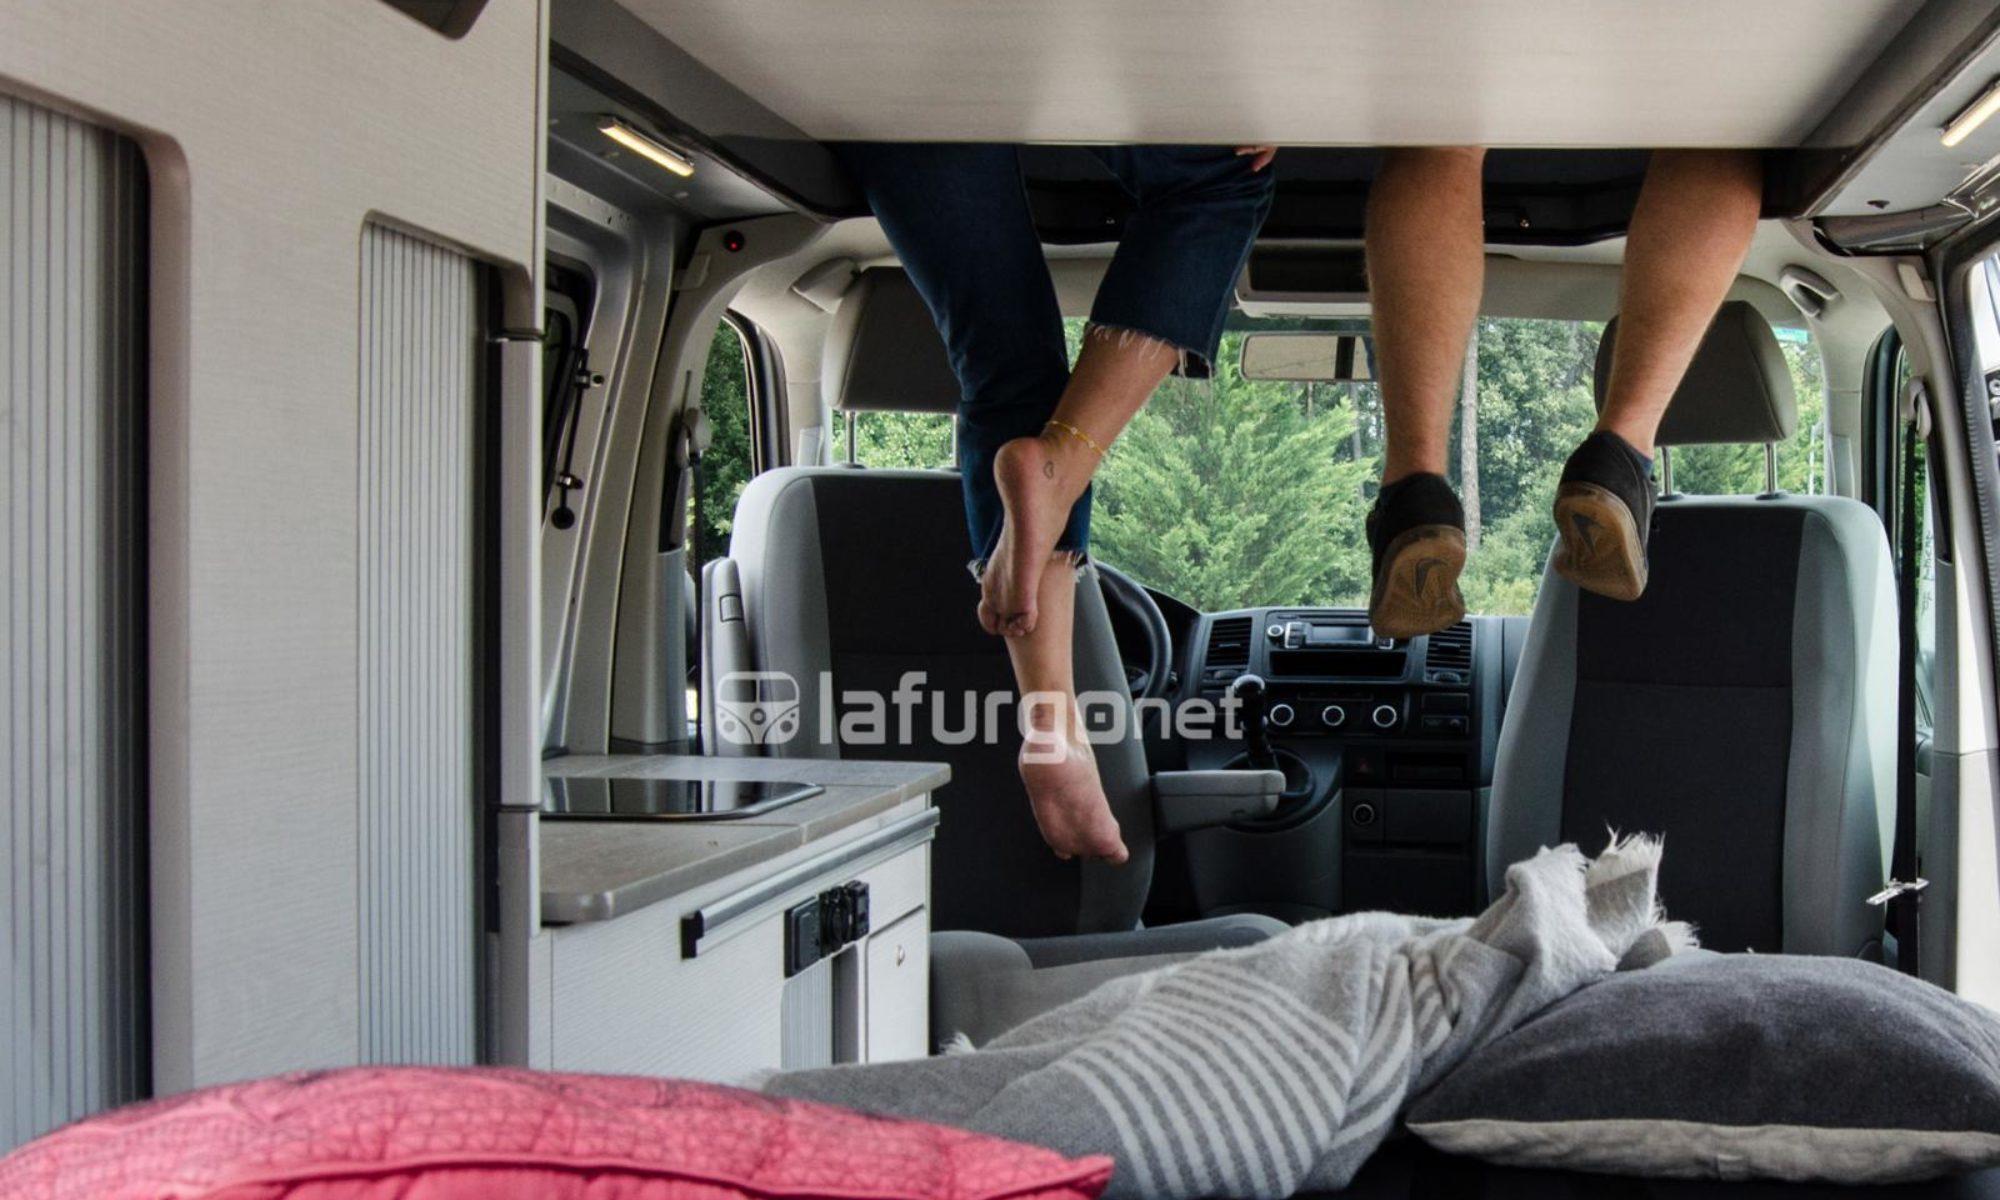 lafurgonet furgonetas camper